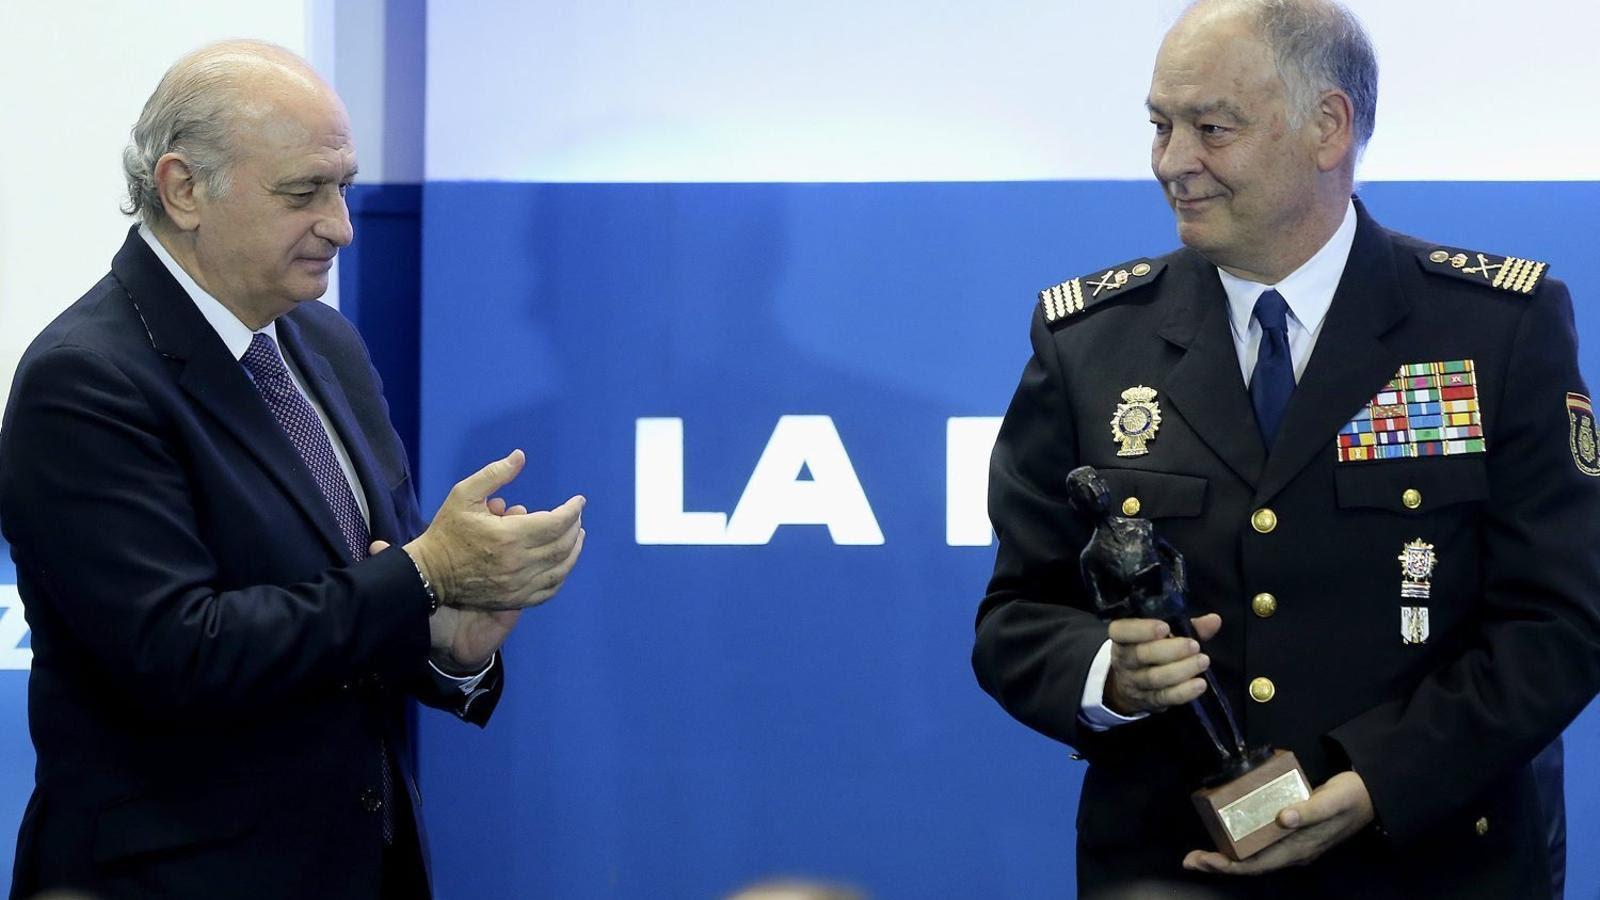 "El ministre Fernández Díaz lliurant a Eugenio Pino una distinció ""a la trajectòria del Cos Nacional de Policia"" concedida pel diari La Razón. / BALLESTEROS / EFE"